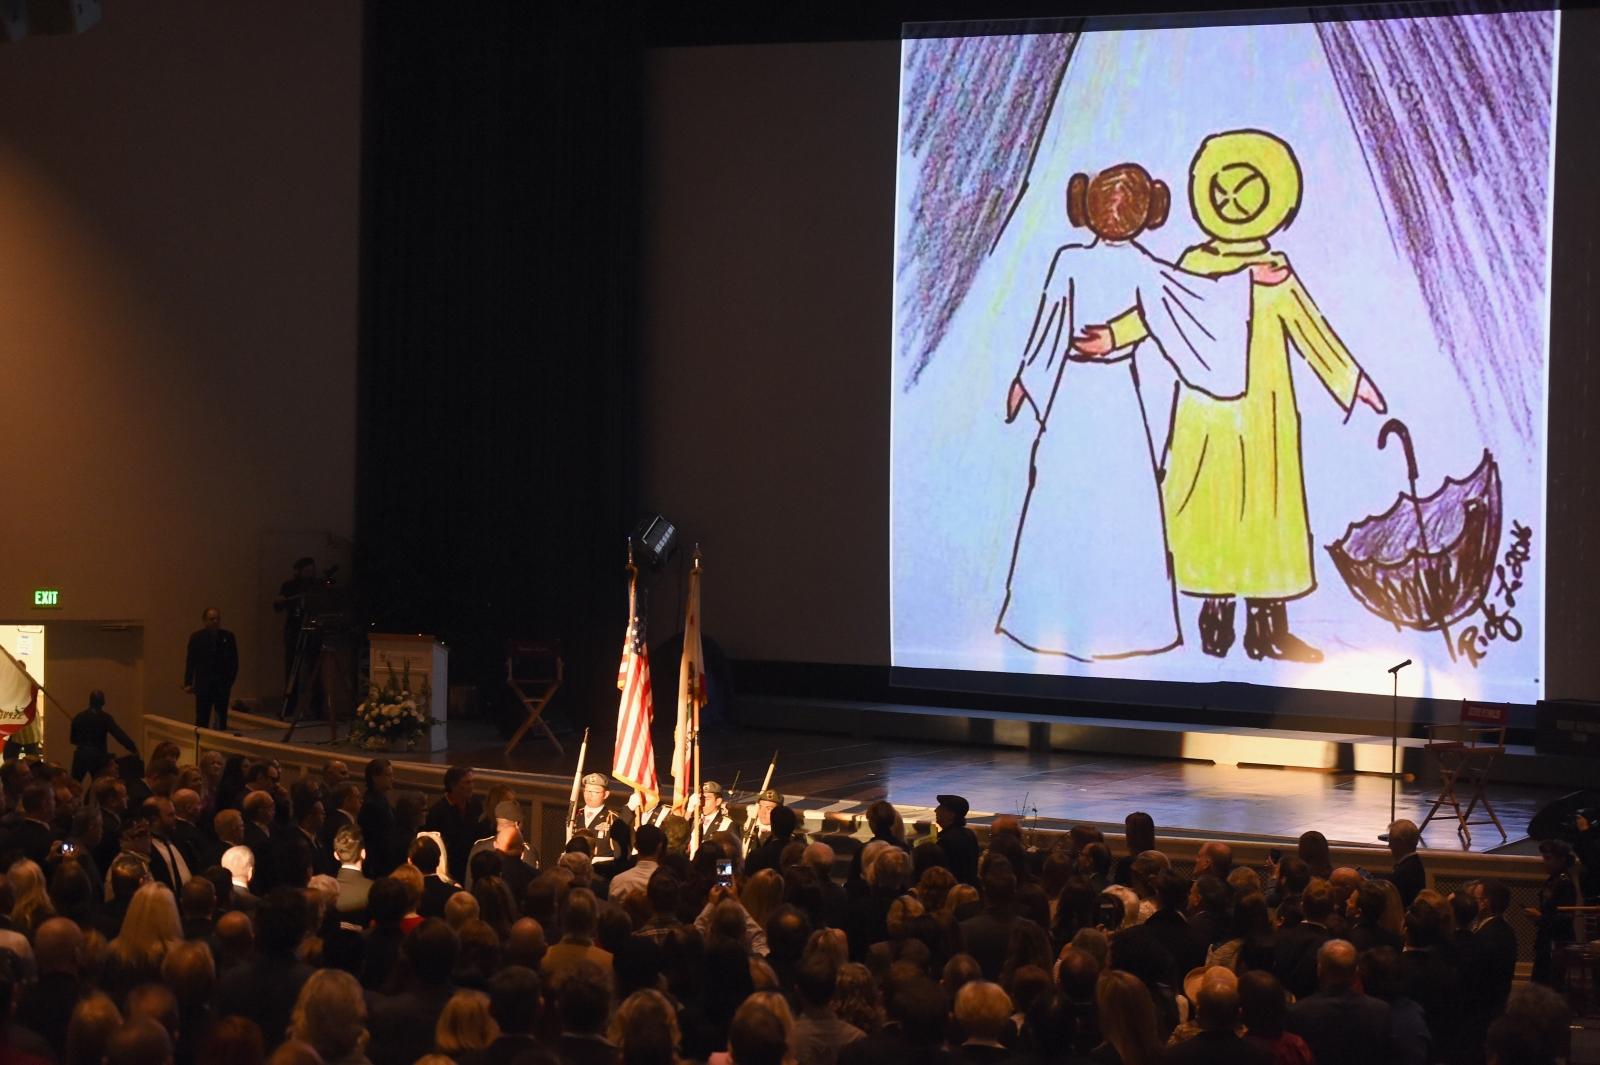 Carrie Fisher Debbie Reynolds public memorial service